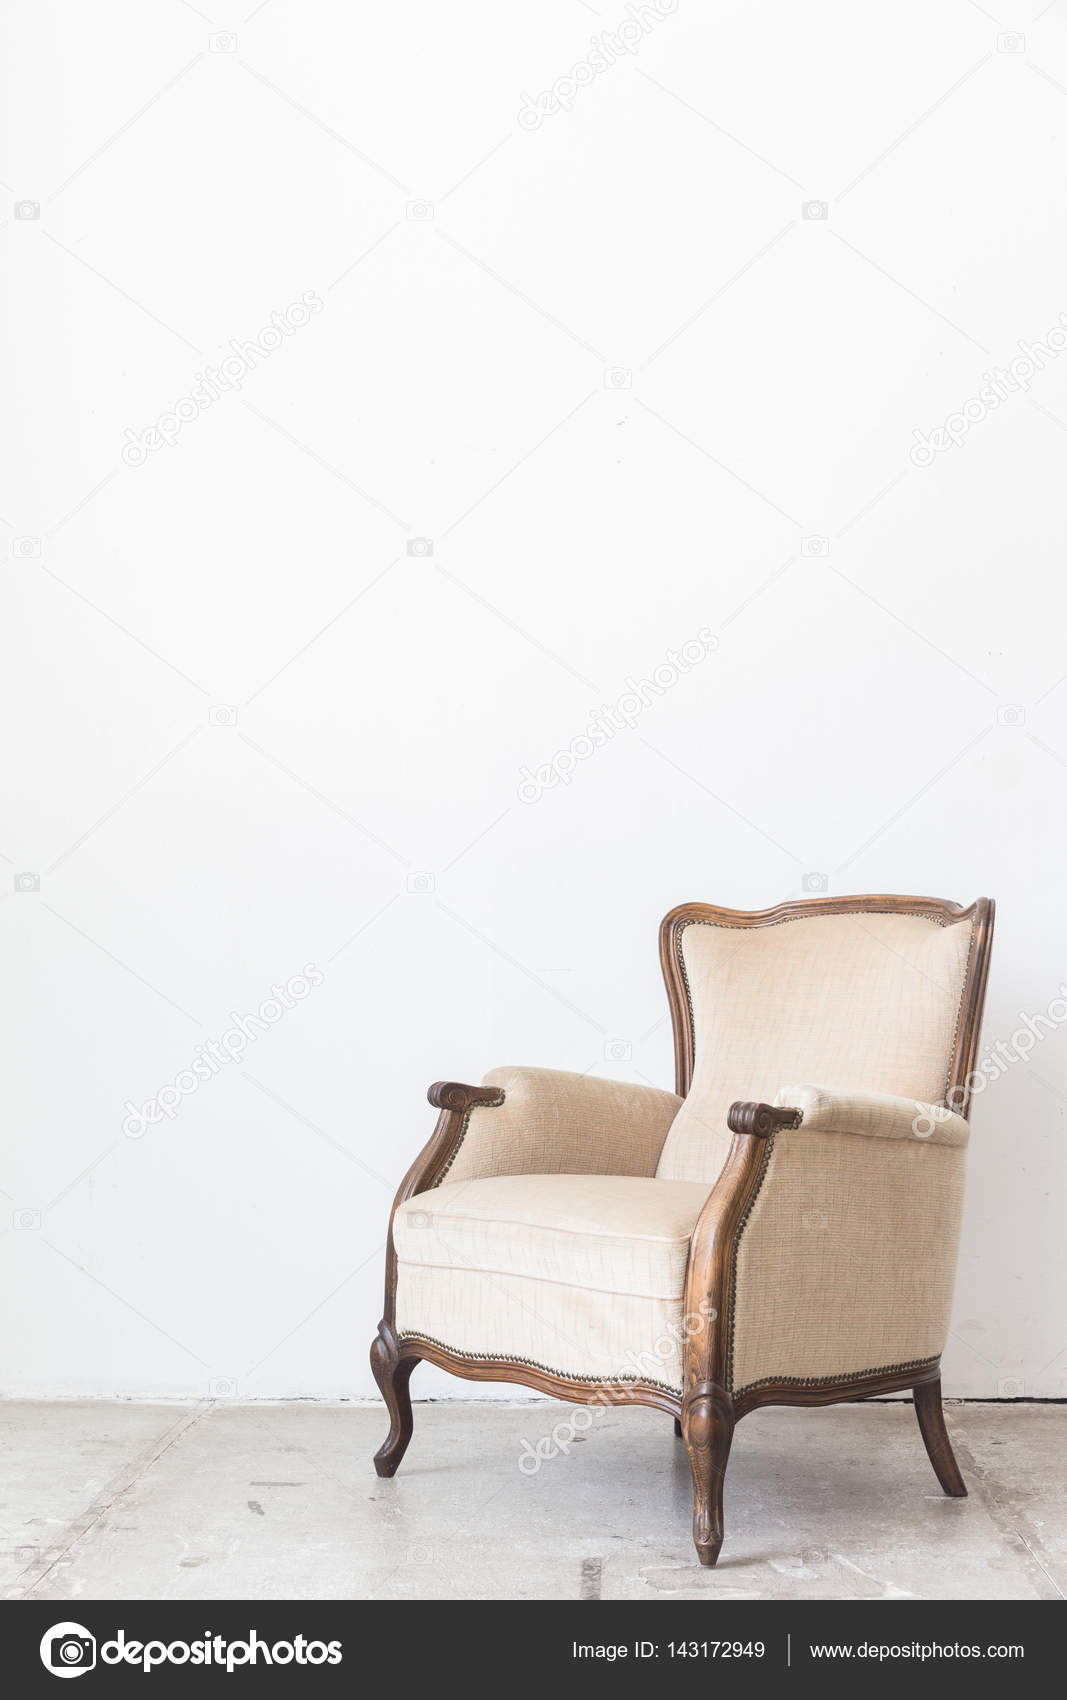 vintage sessel auf wei e wand stockfoto pigprox 143172949. Black Bedroom Furniture Sets. Home Design Ideas